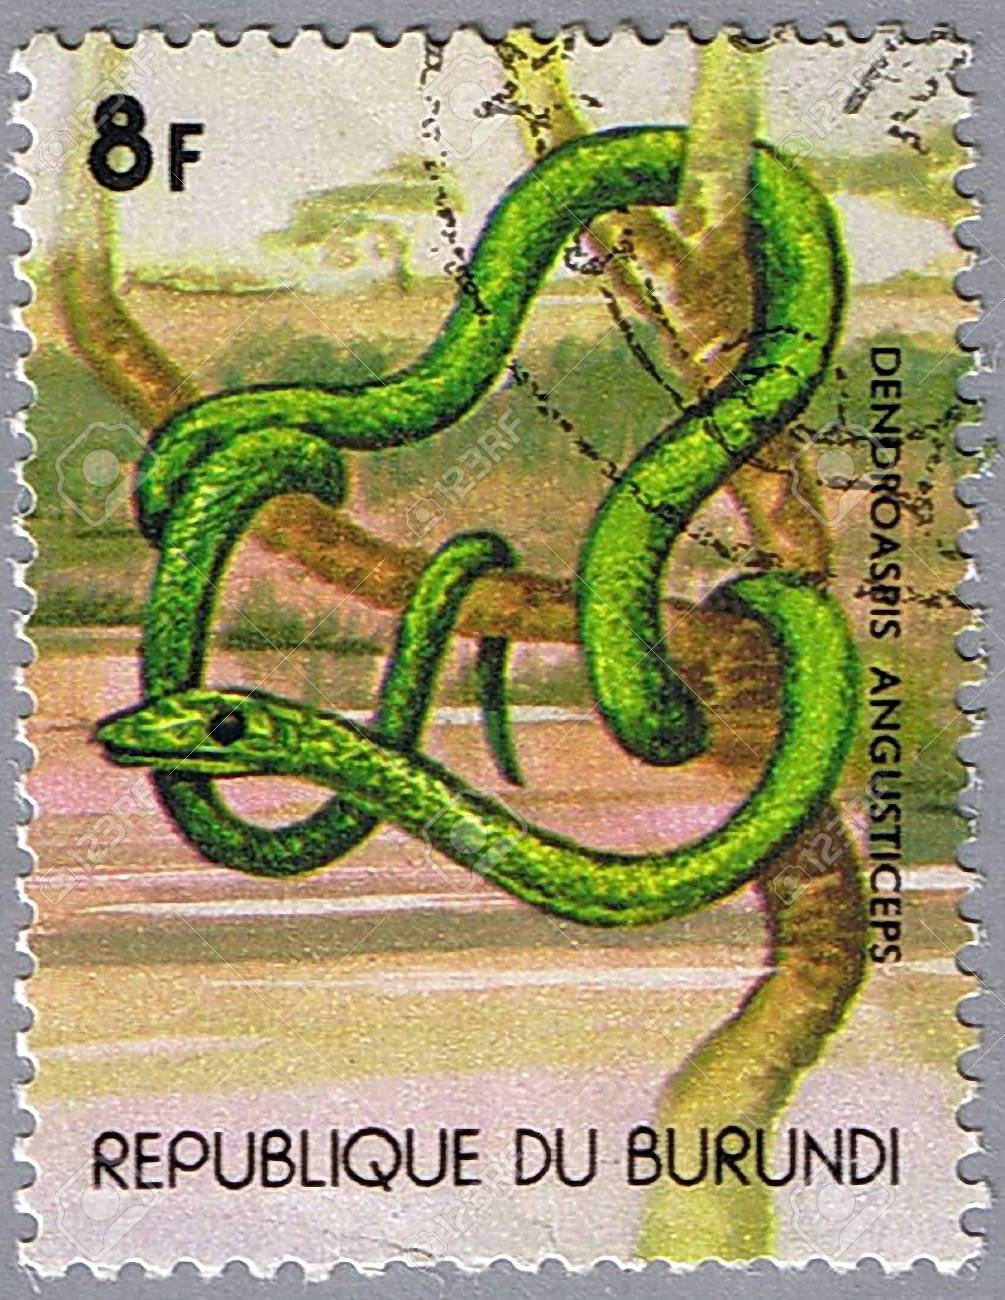 REPUBLIC OF BURUNDI - CIRCA 1977: A stamp printed in Republic of Burundi shows green mamba, series, circa 1977 Stock Photo - 7953440